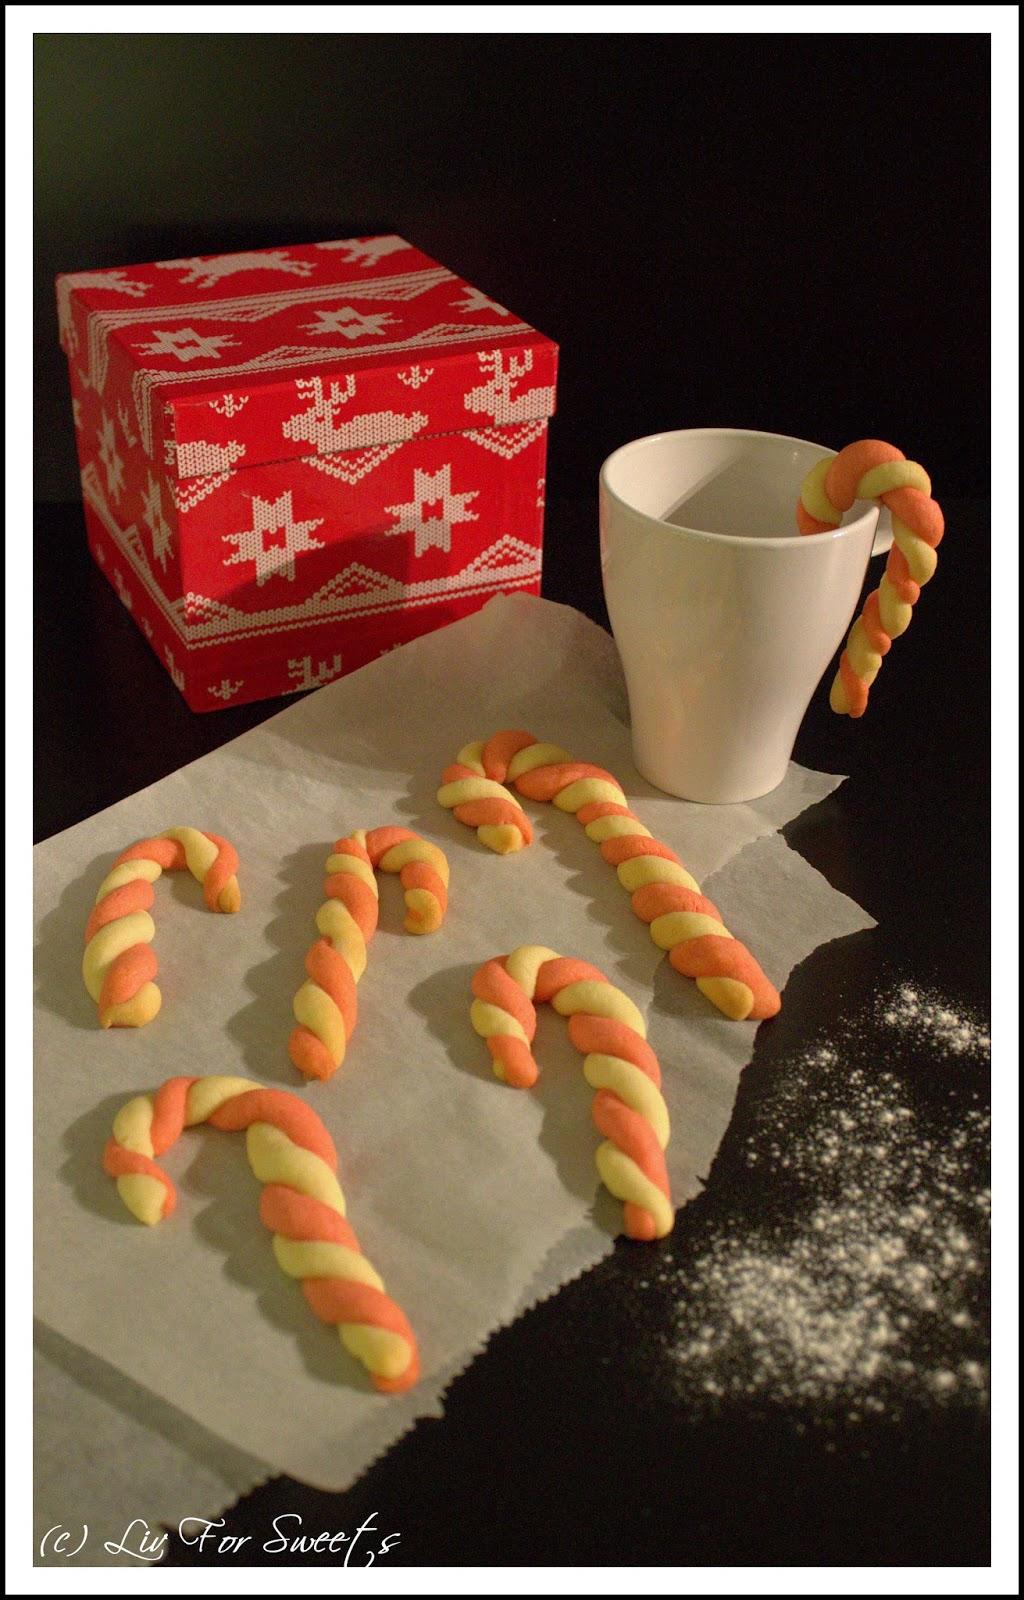 Zuckerstangen-Kekse, Candy Cane Cookies, Weihnachtsbäckerei, Rot, Weiß, Gestreift, Rezept, Thermomix